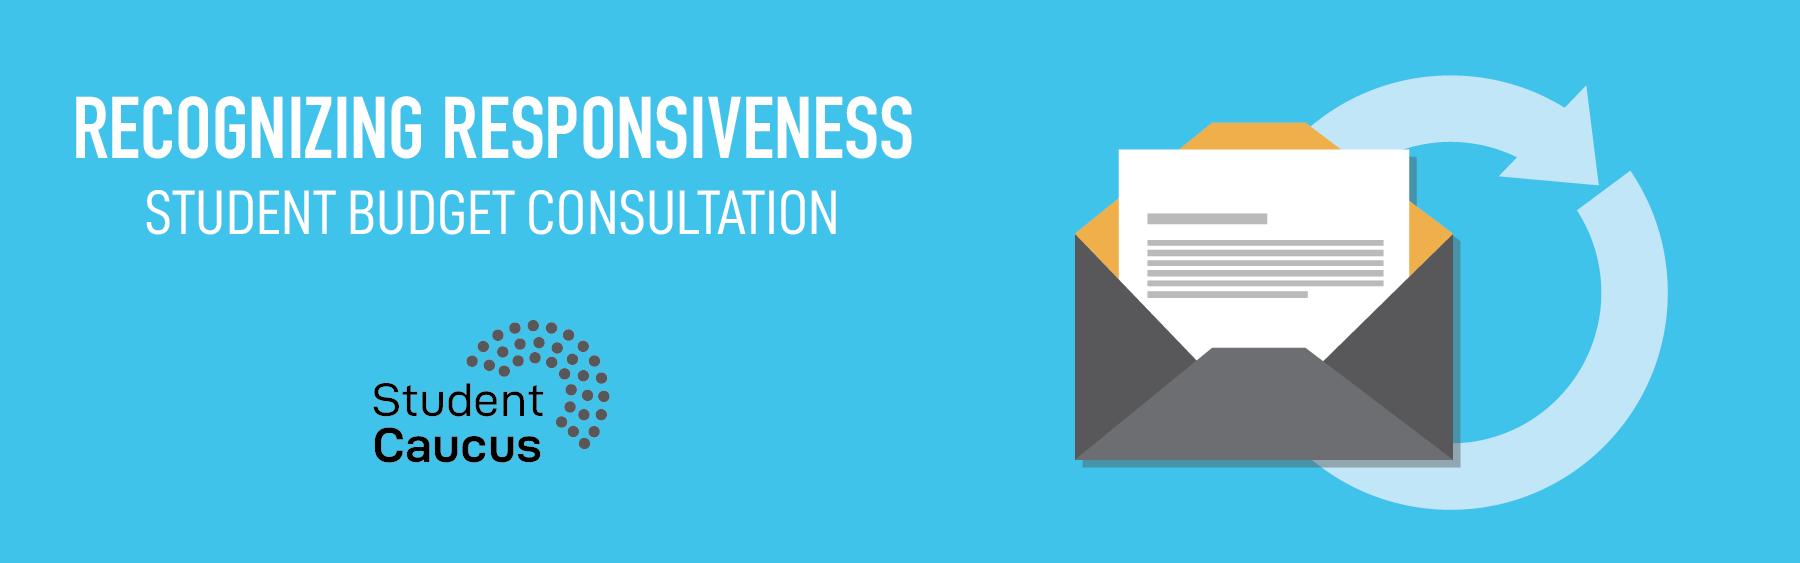 Recognizing Responsiveness